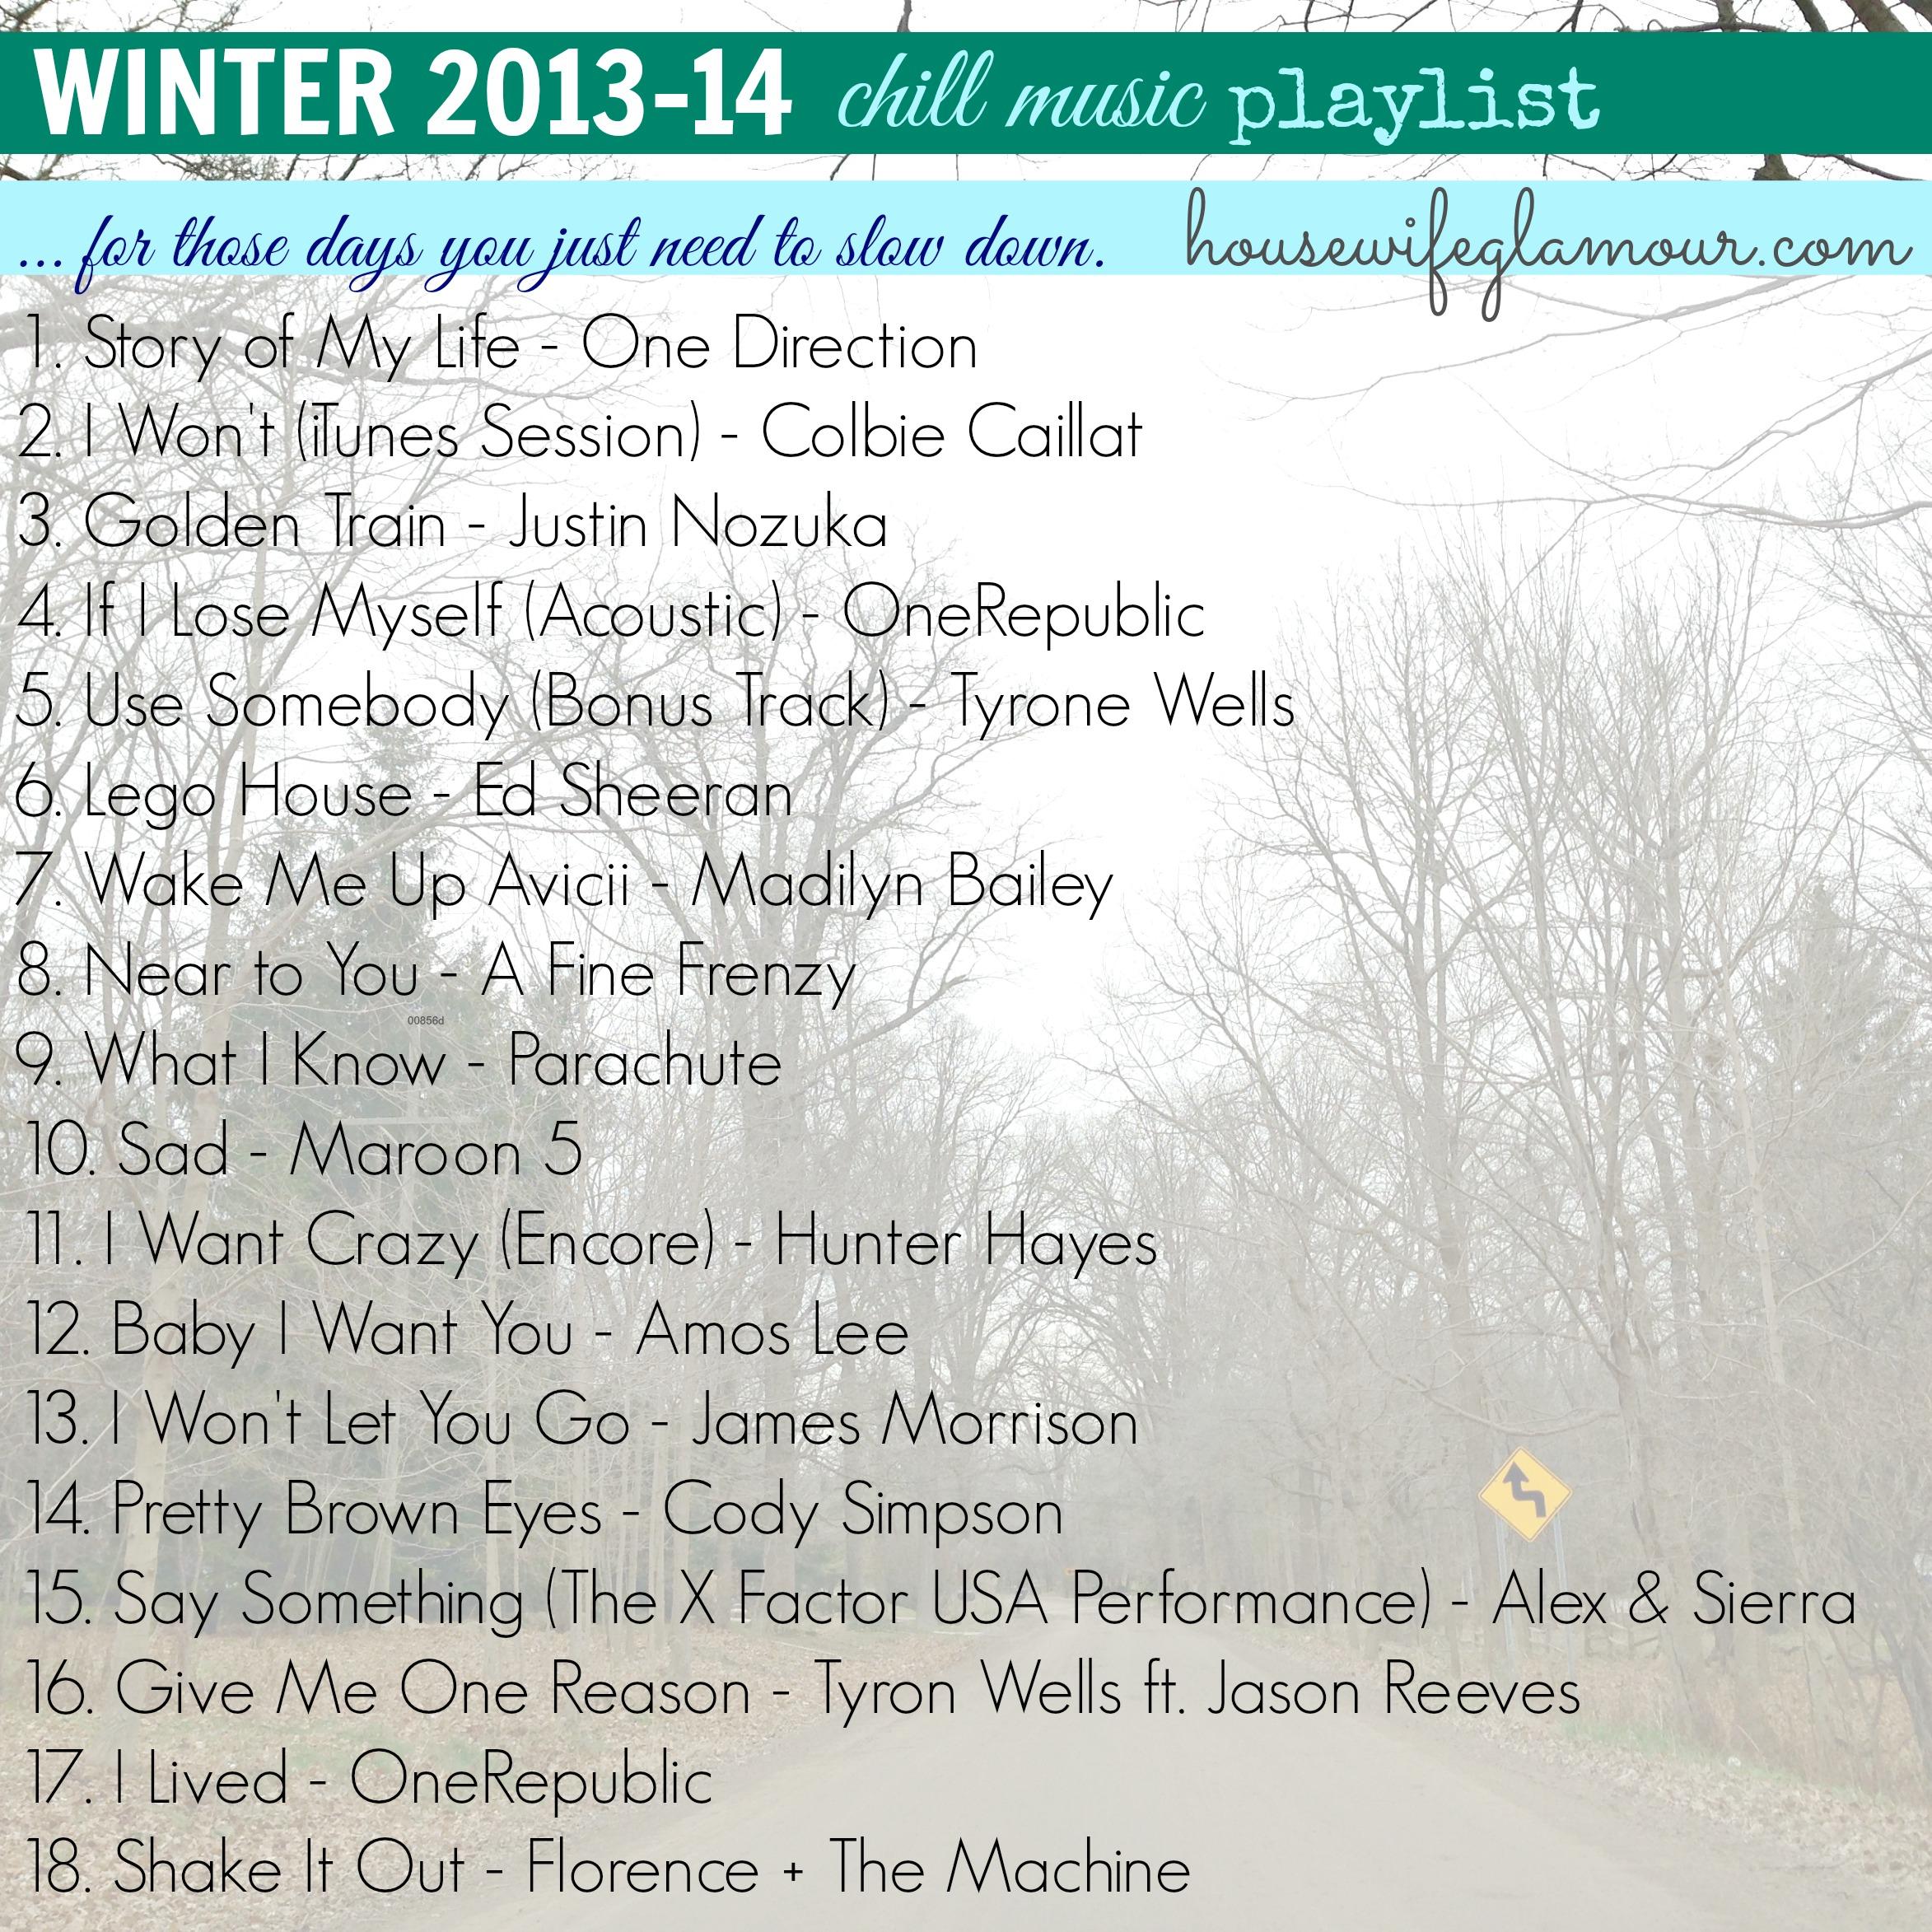 winter 2014 chill slow down playlist